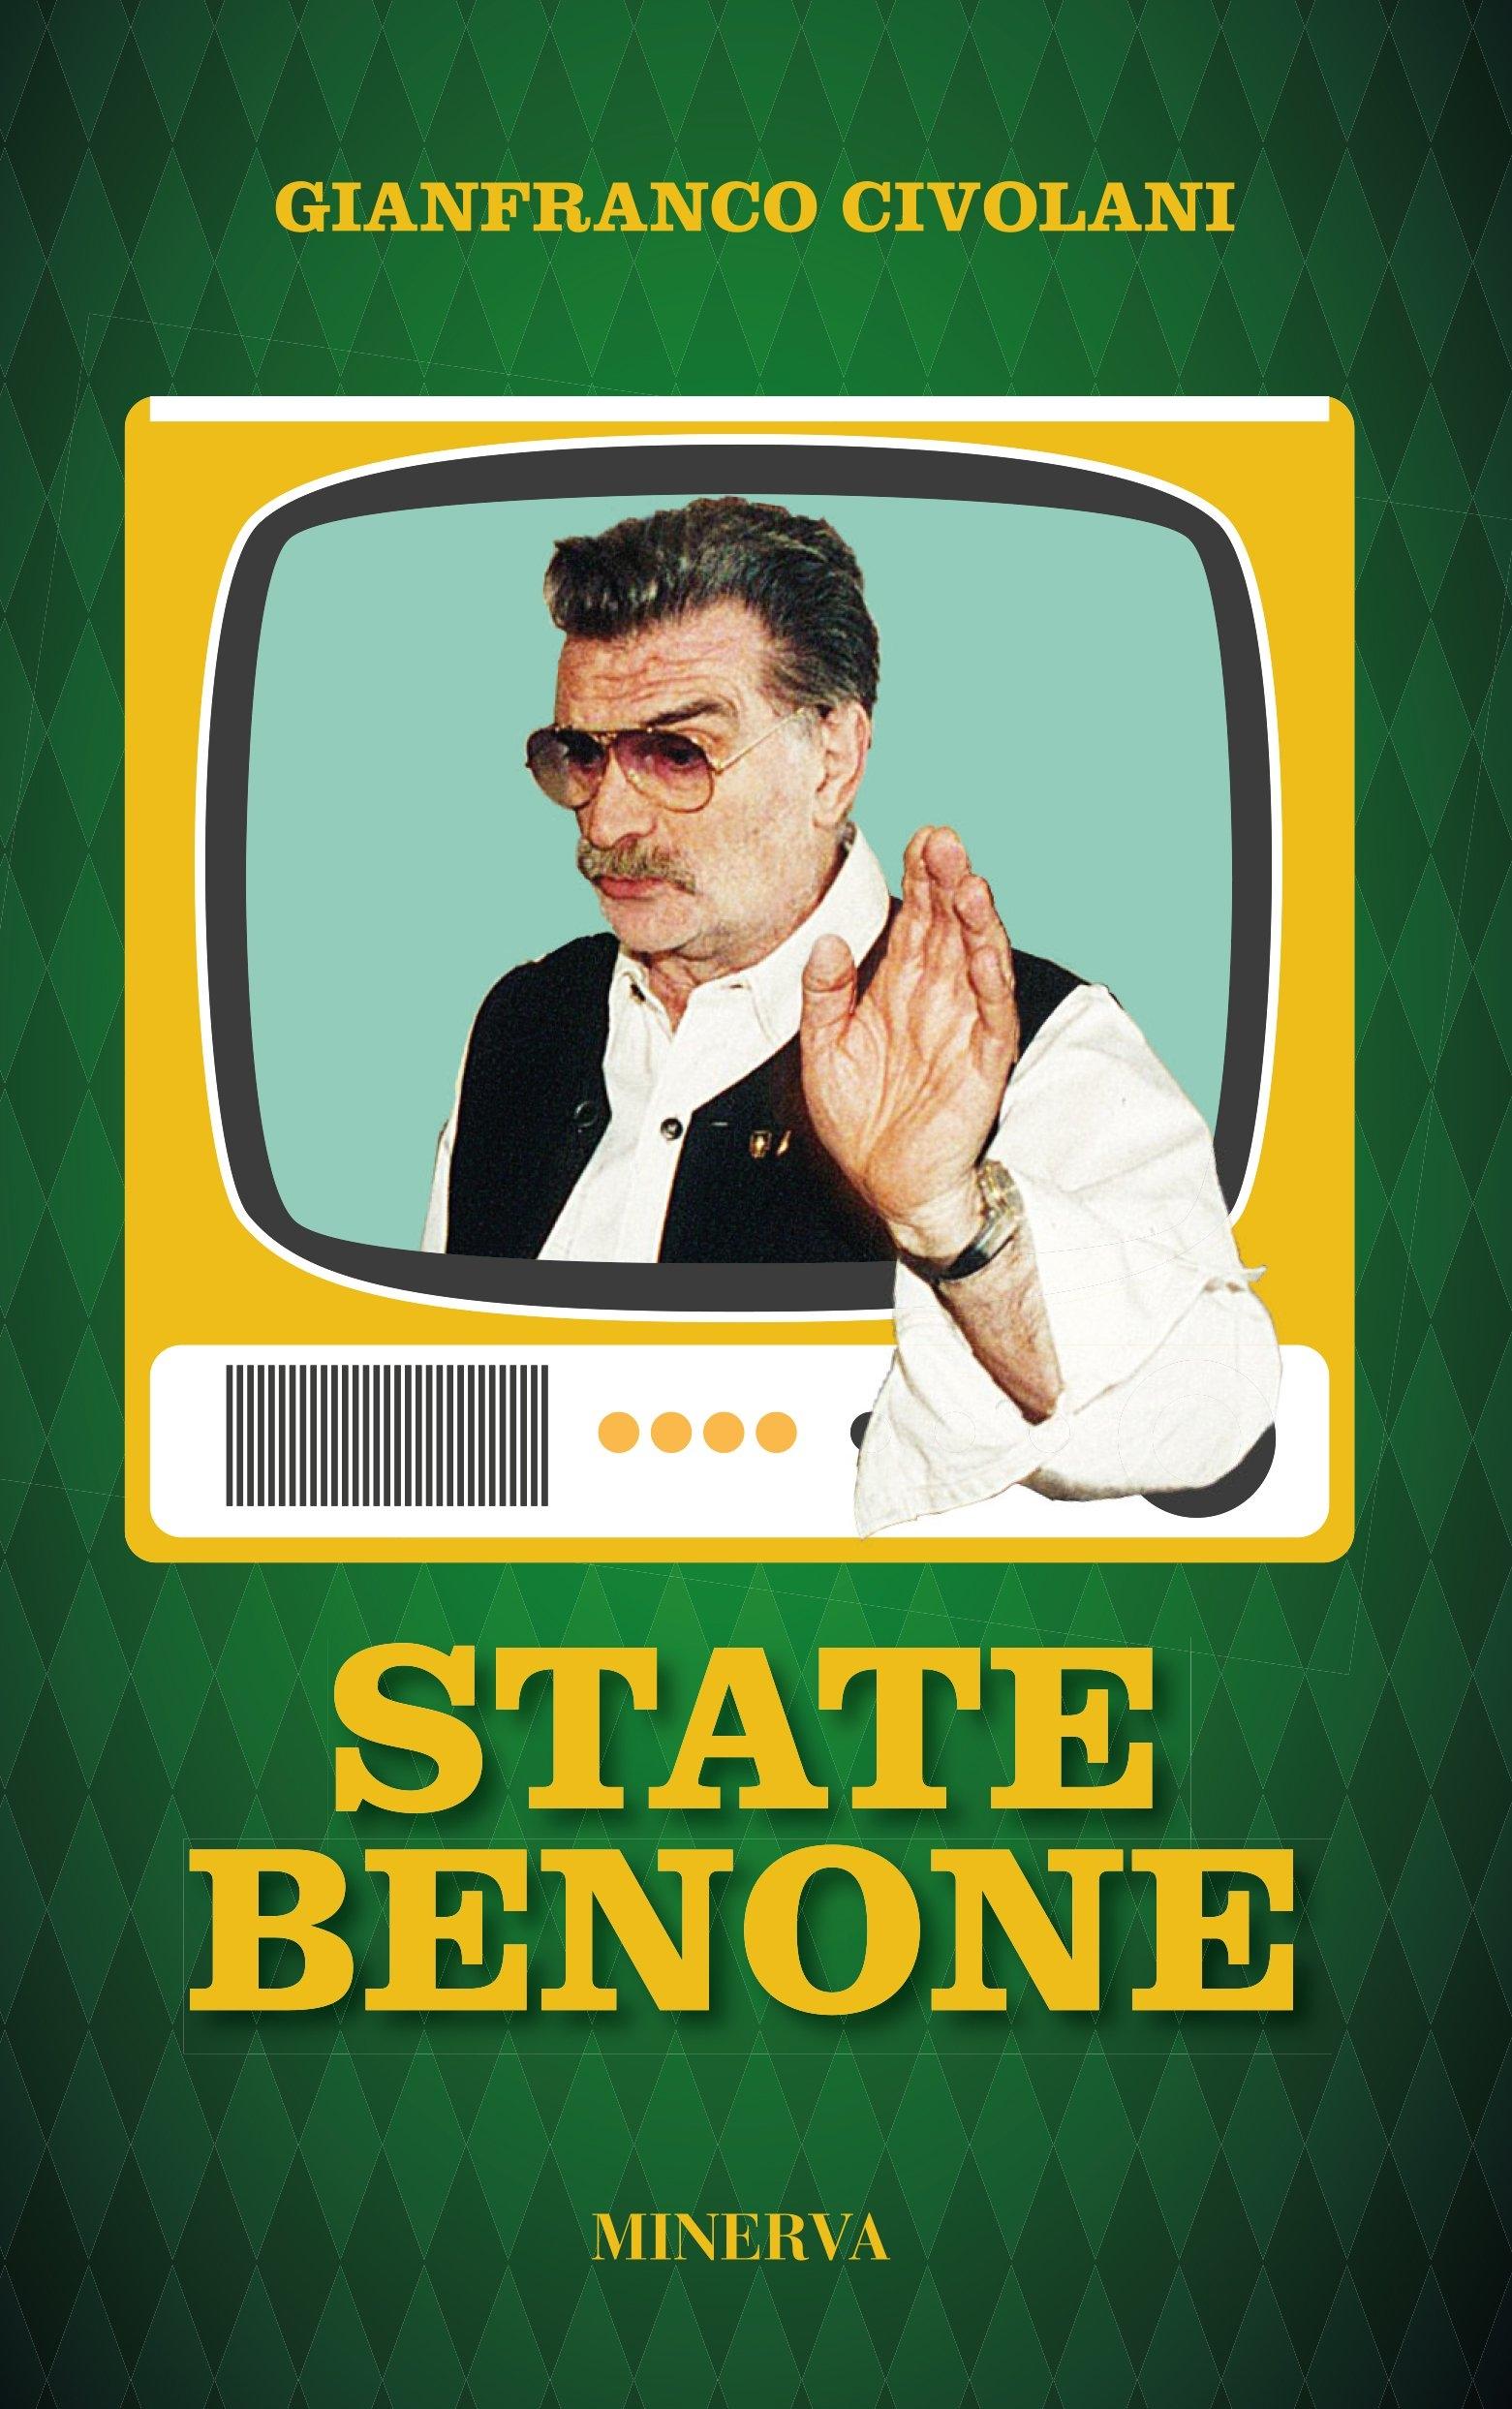 State benone